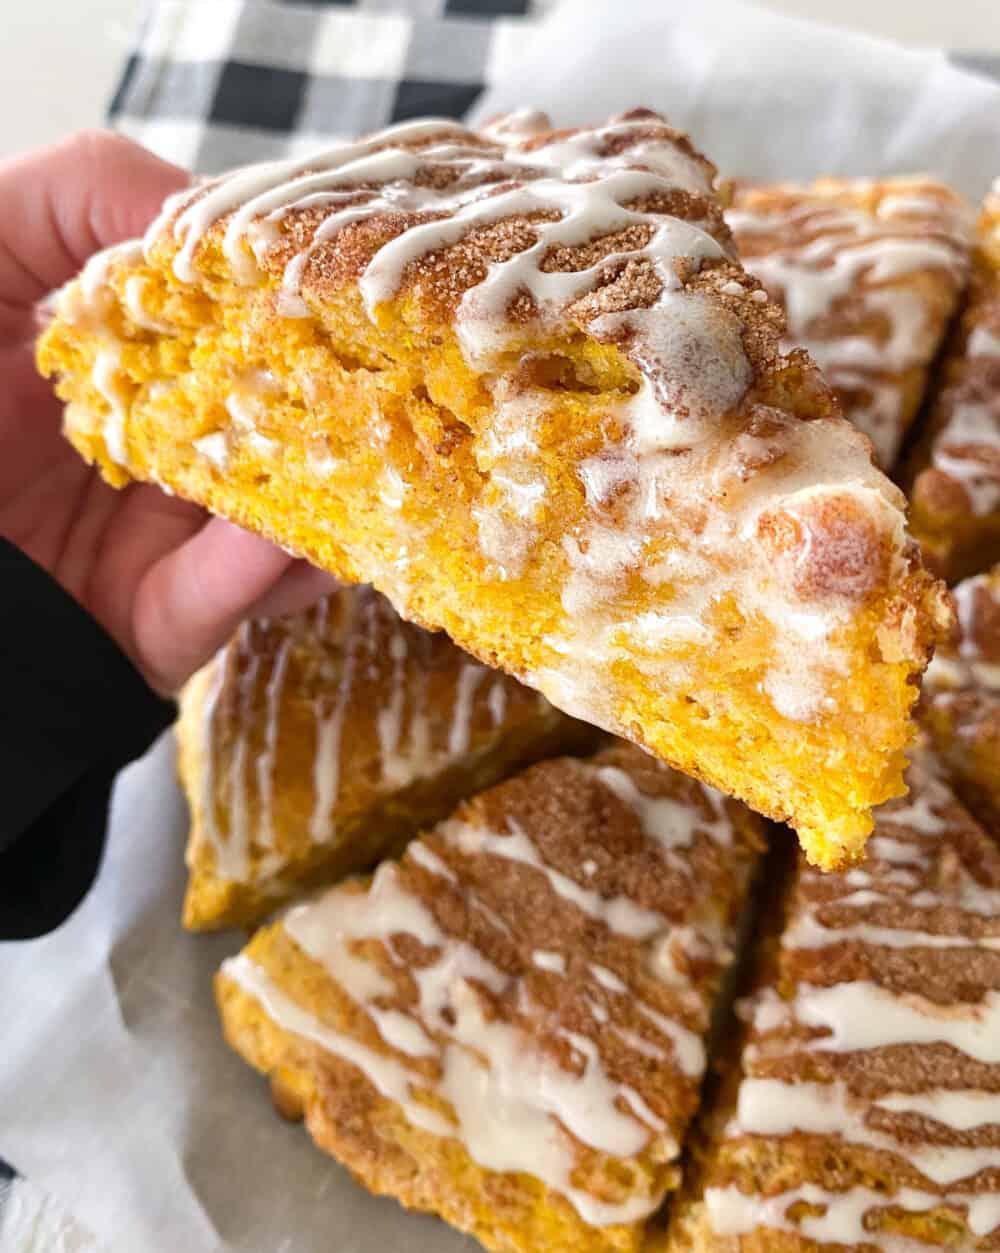 showing inside of baked pumpkin scones